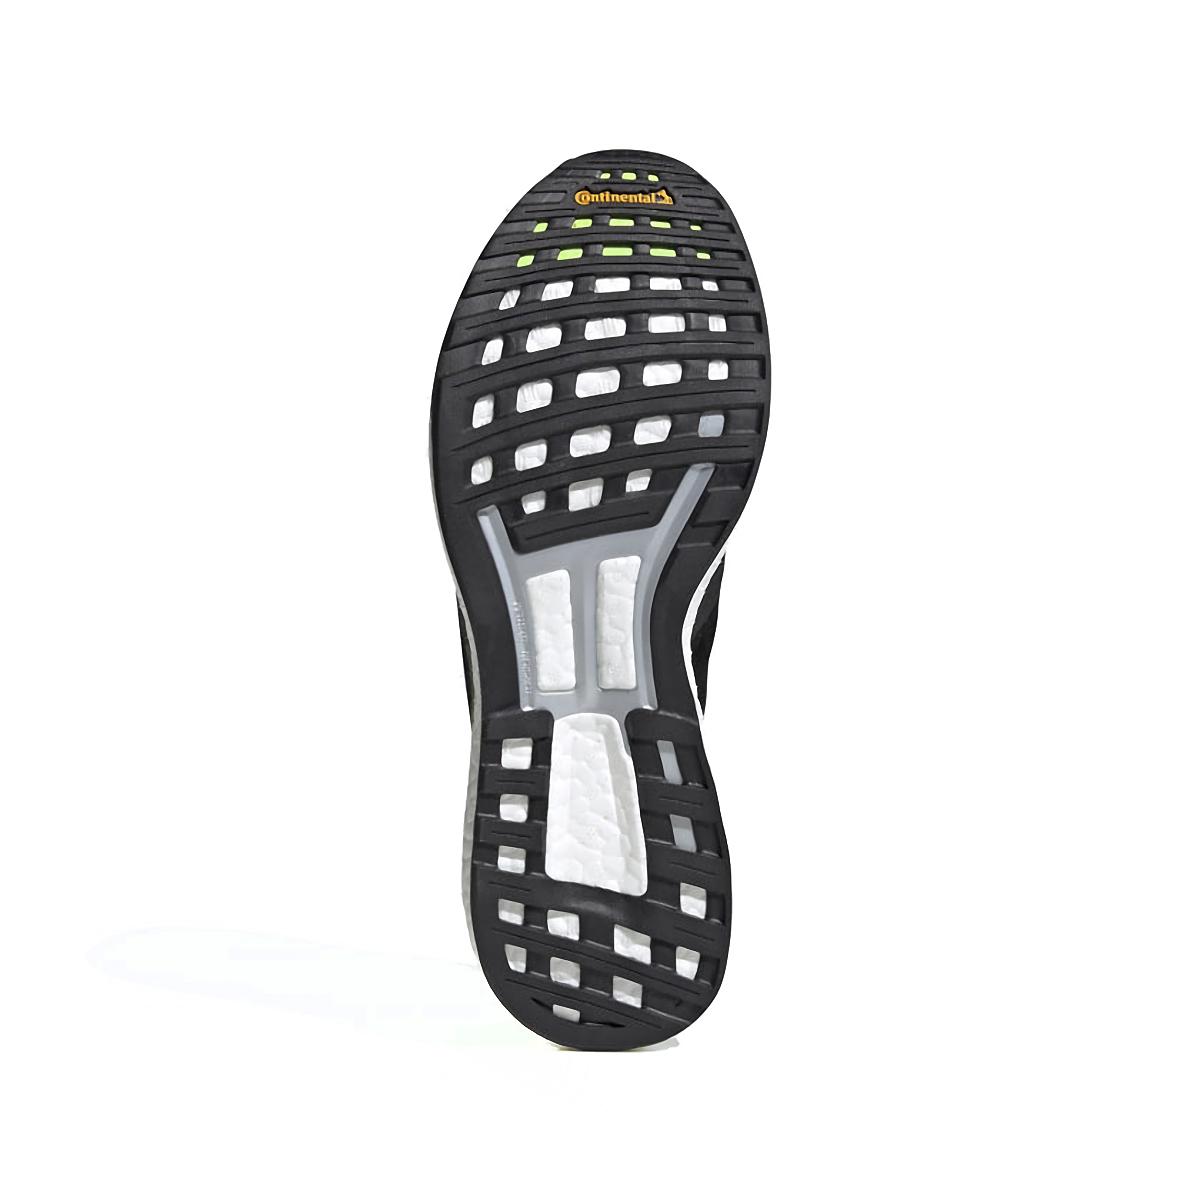 Men's Adidas Adizero Boston 9 Running Shoe - Color: Core Black/Core - Size: 6.5 - Width: Regular, Core Black/Core, large, image 3